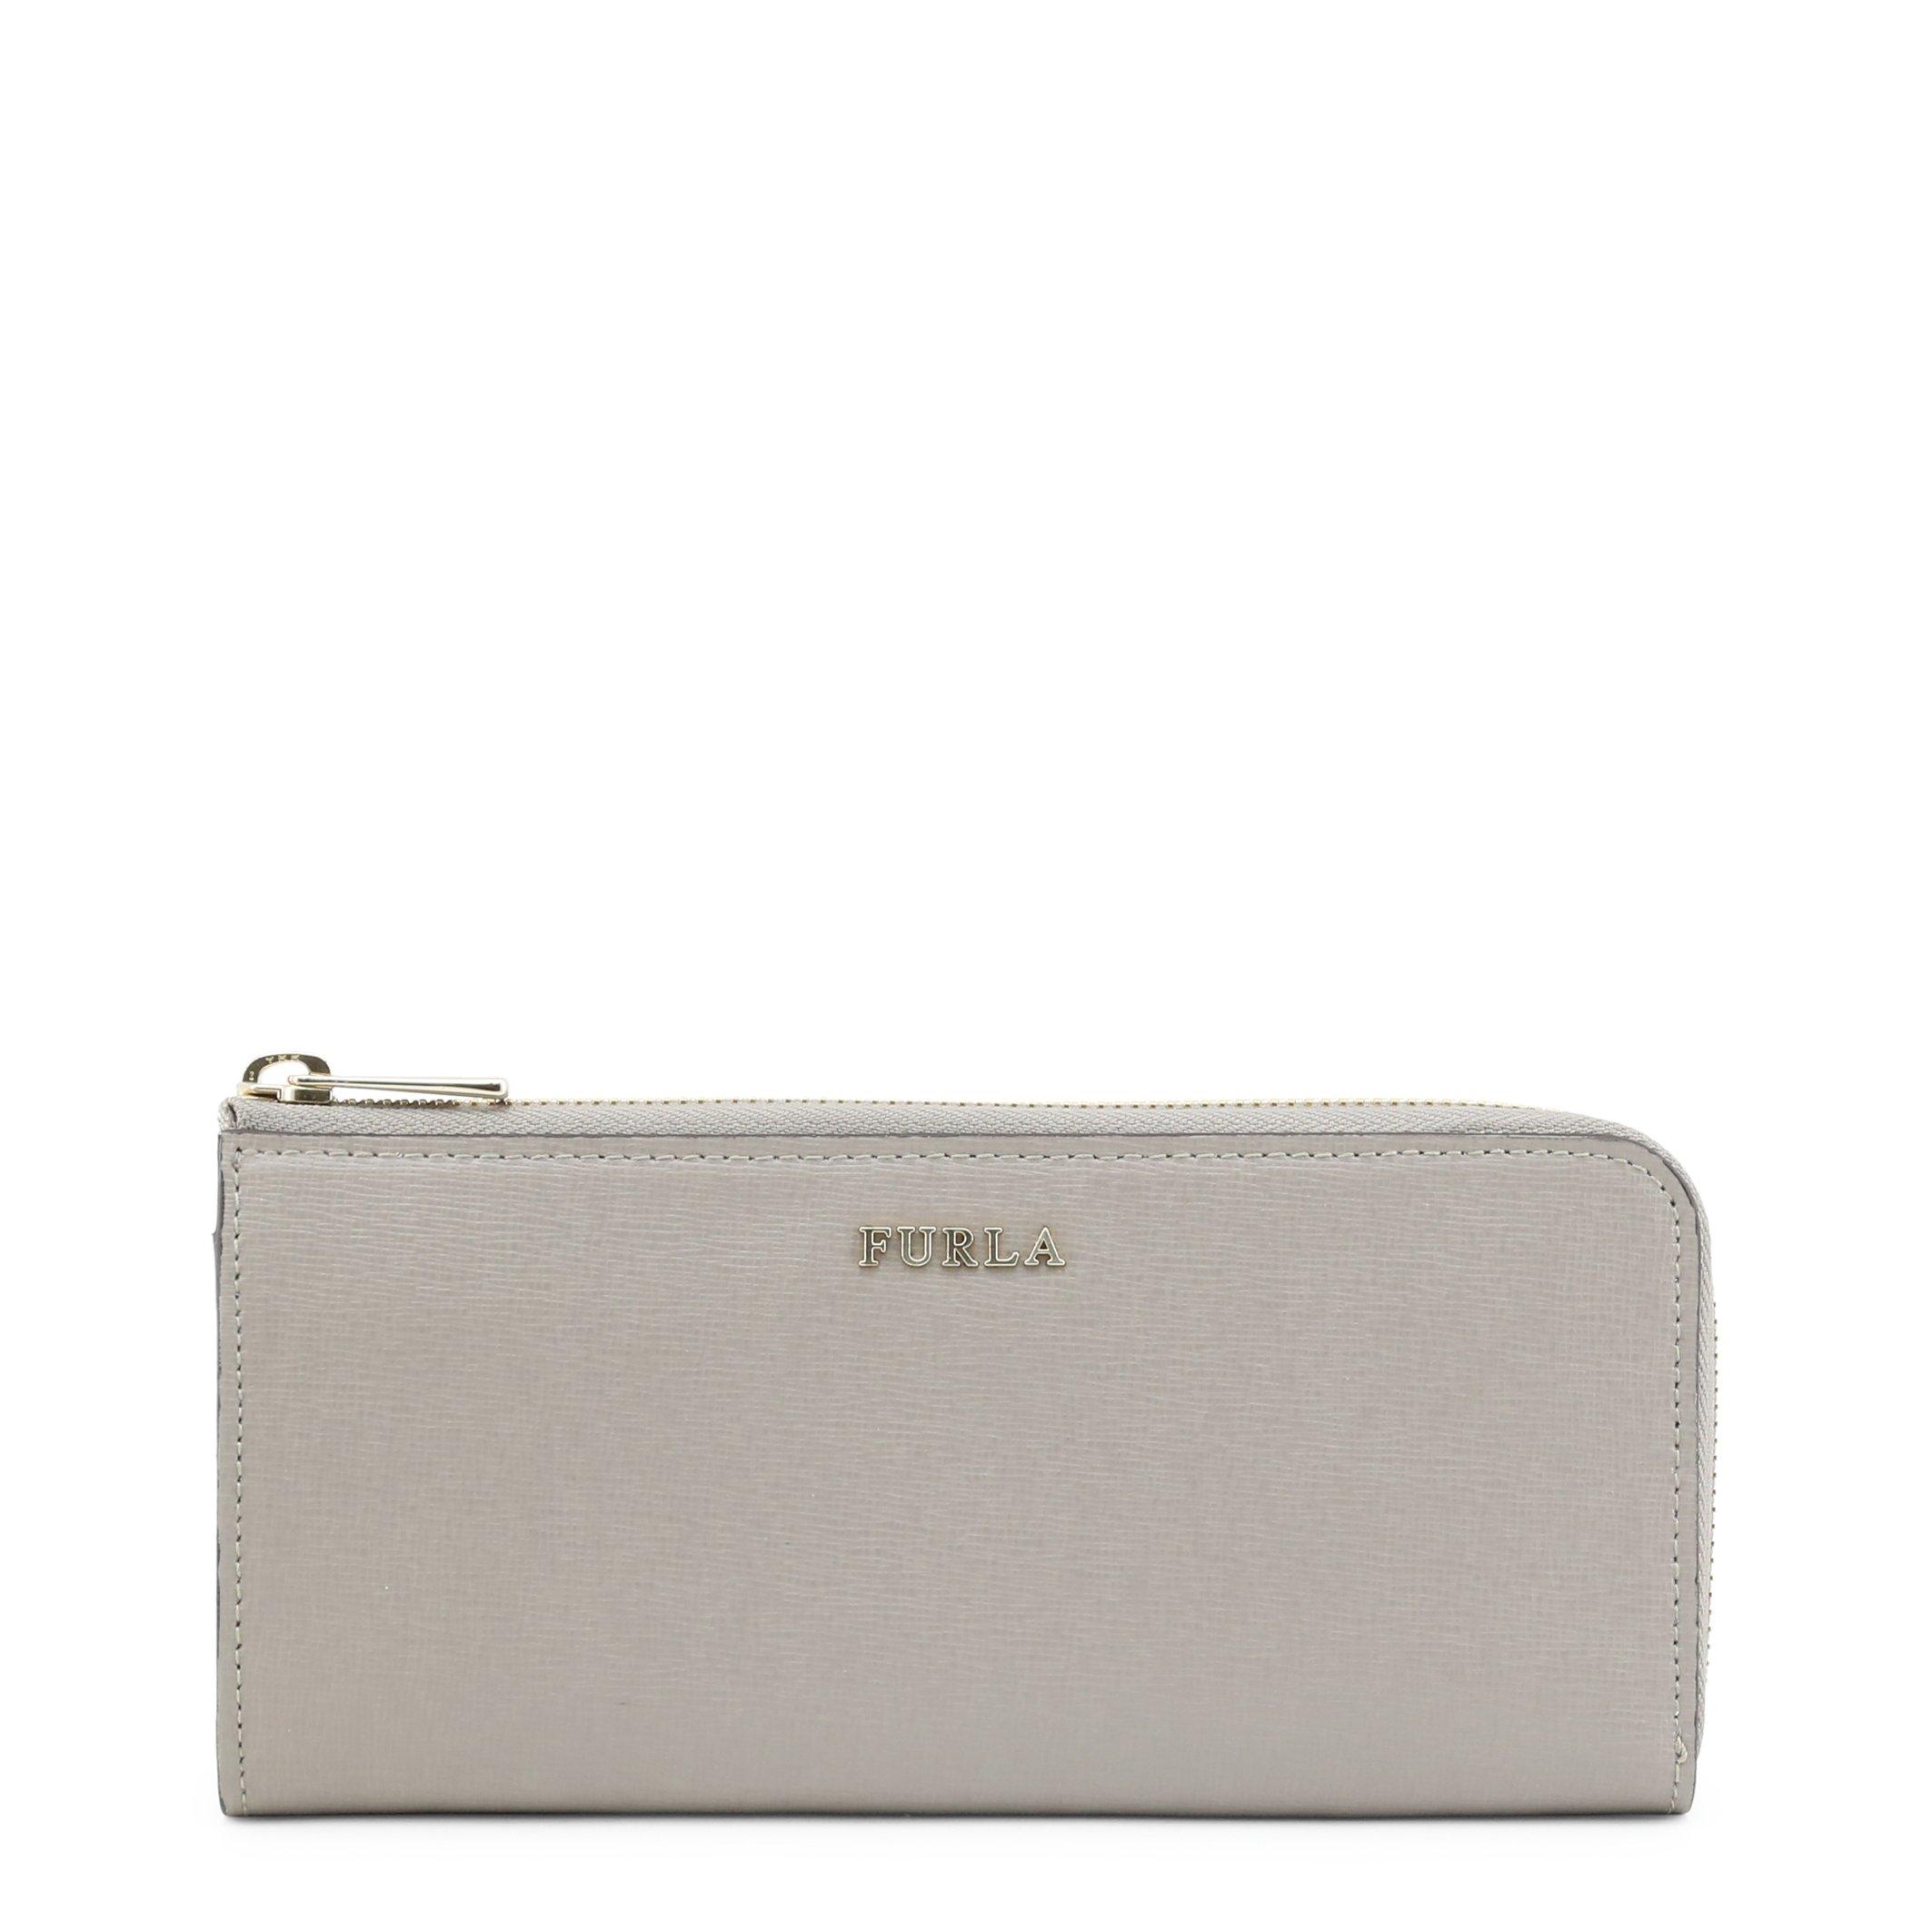 Furla Women's Wallet Various Colours PS13_BABYLON - brown NOSIZE